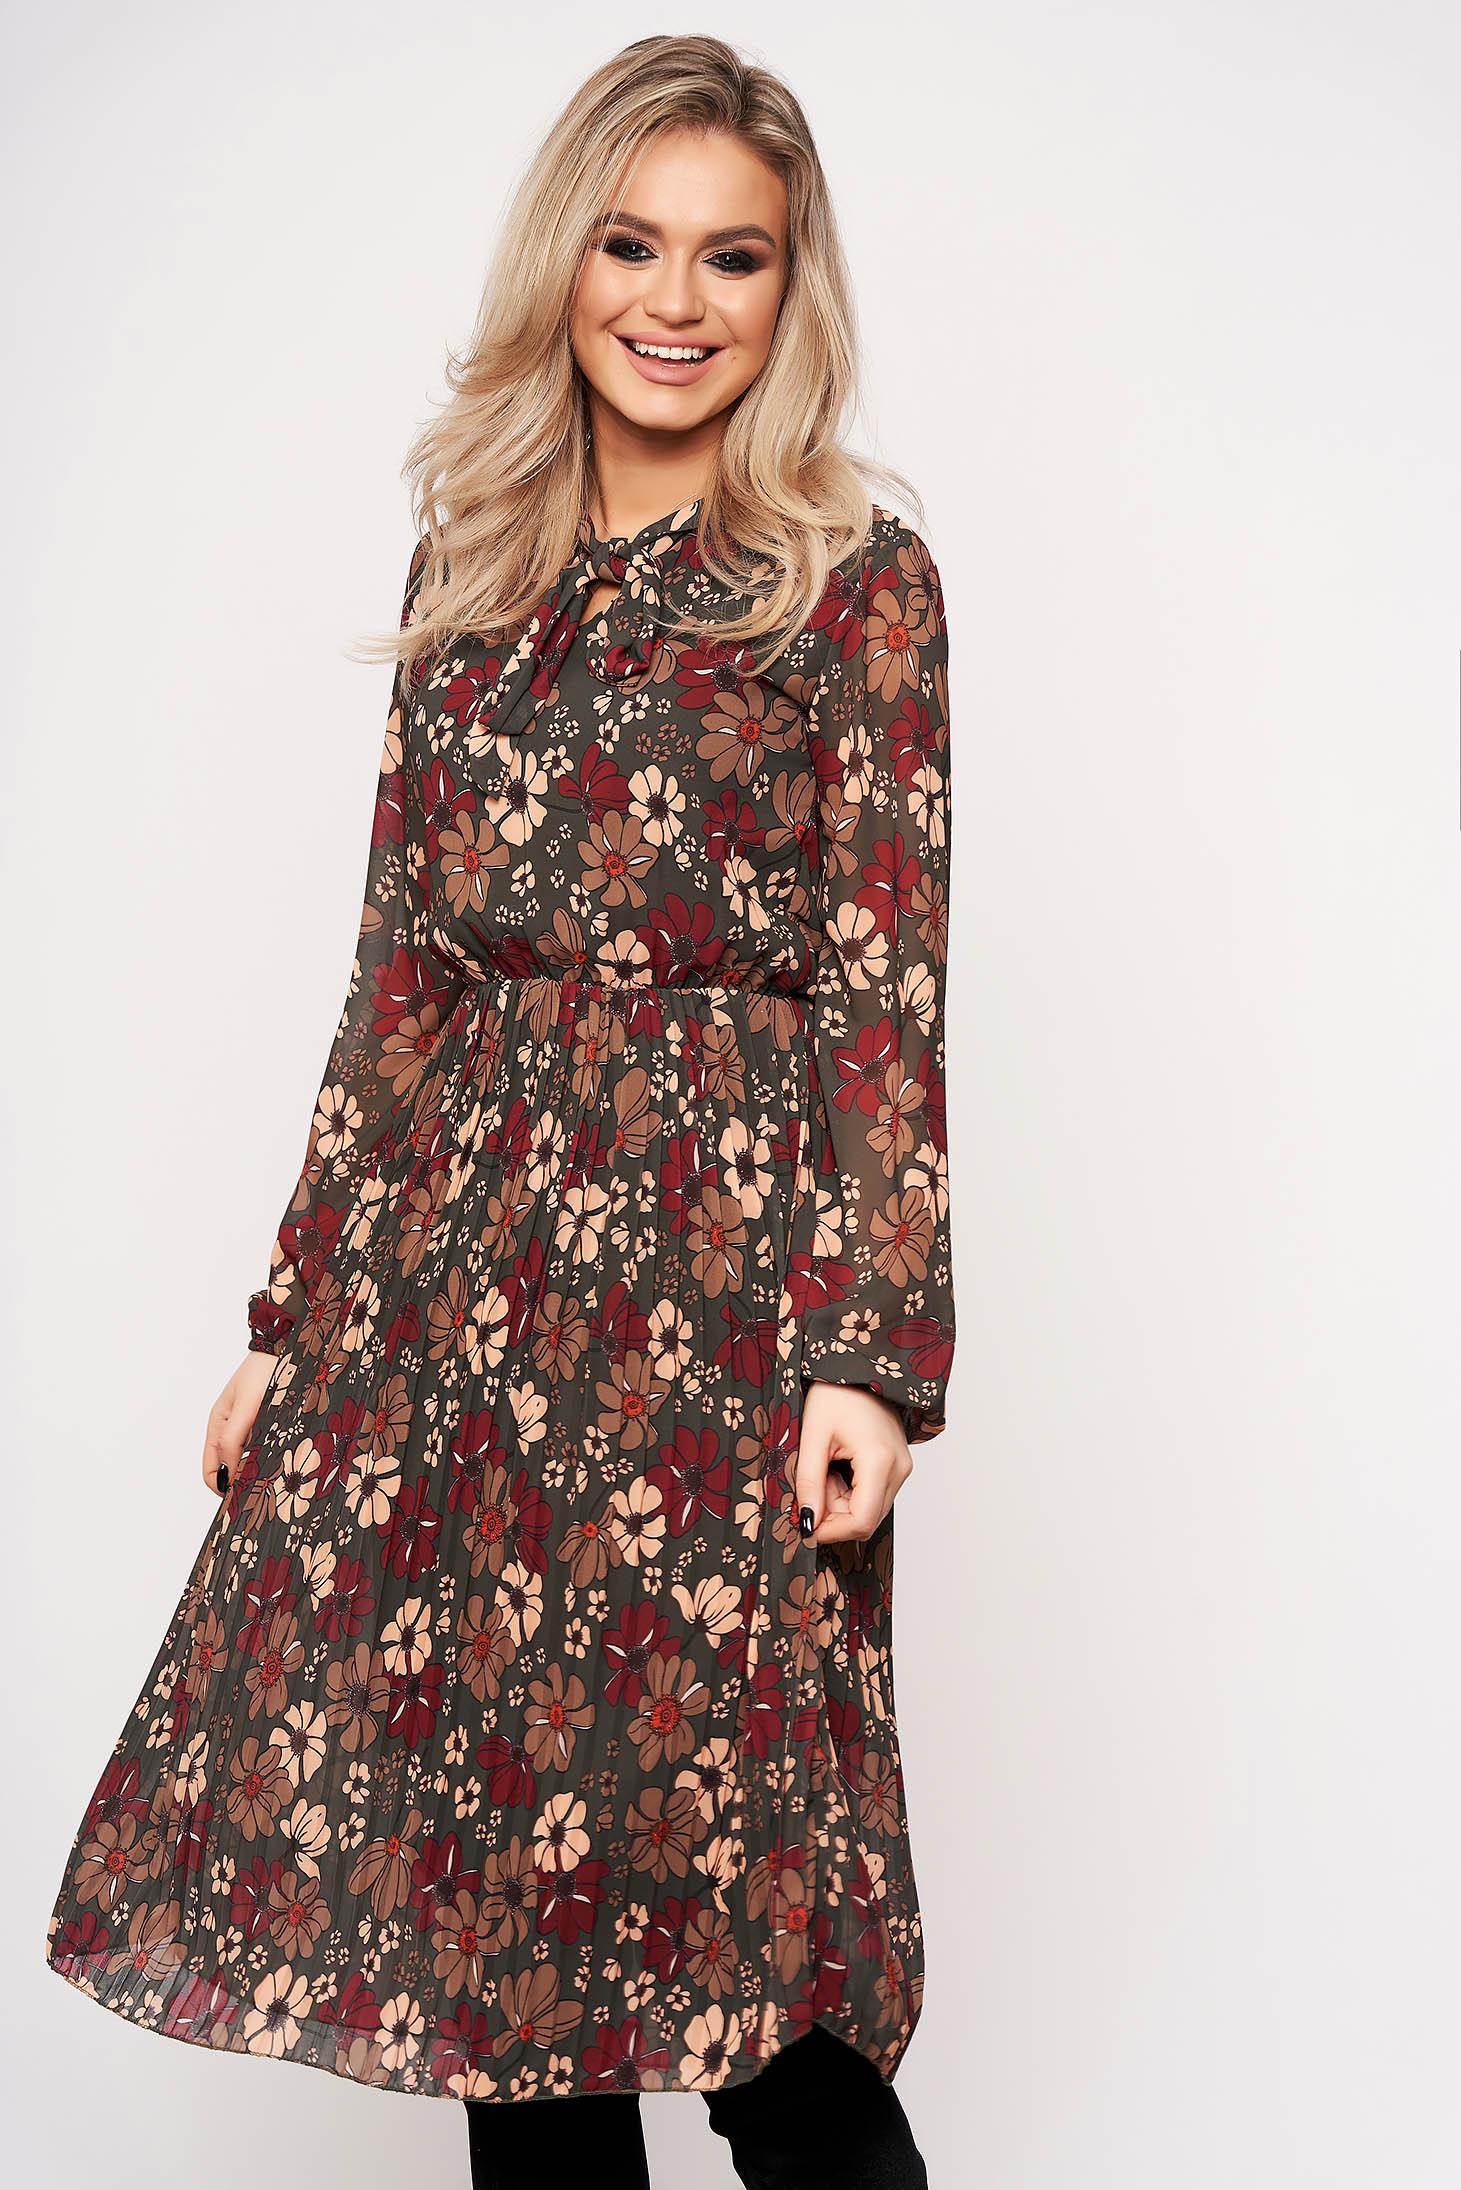 Rochie SunShine khaki de zi cu imprimeuri florale care se leaga cu fundita la gat si are elastic in talie